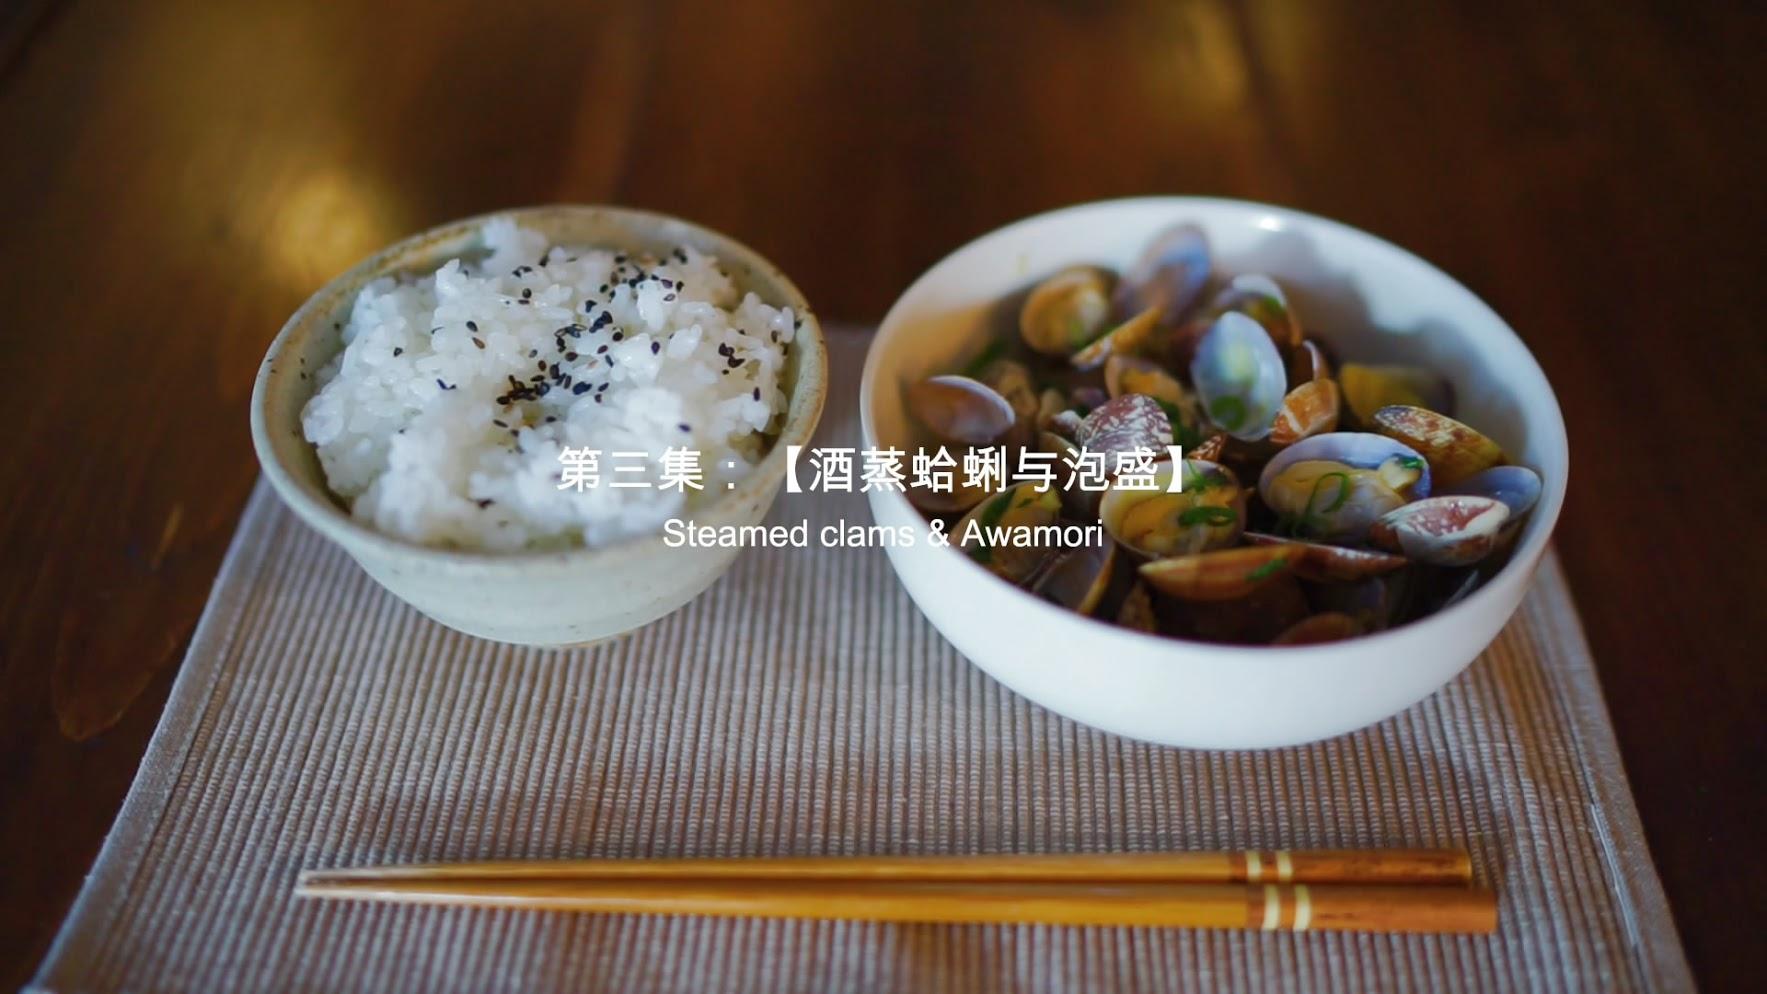 [sub]第三集酒蒸蛤蜊[00_00_34][20151202-110407-0]